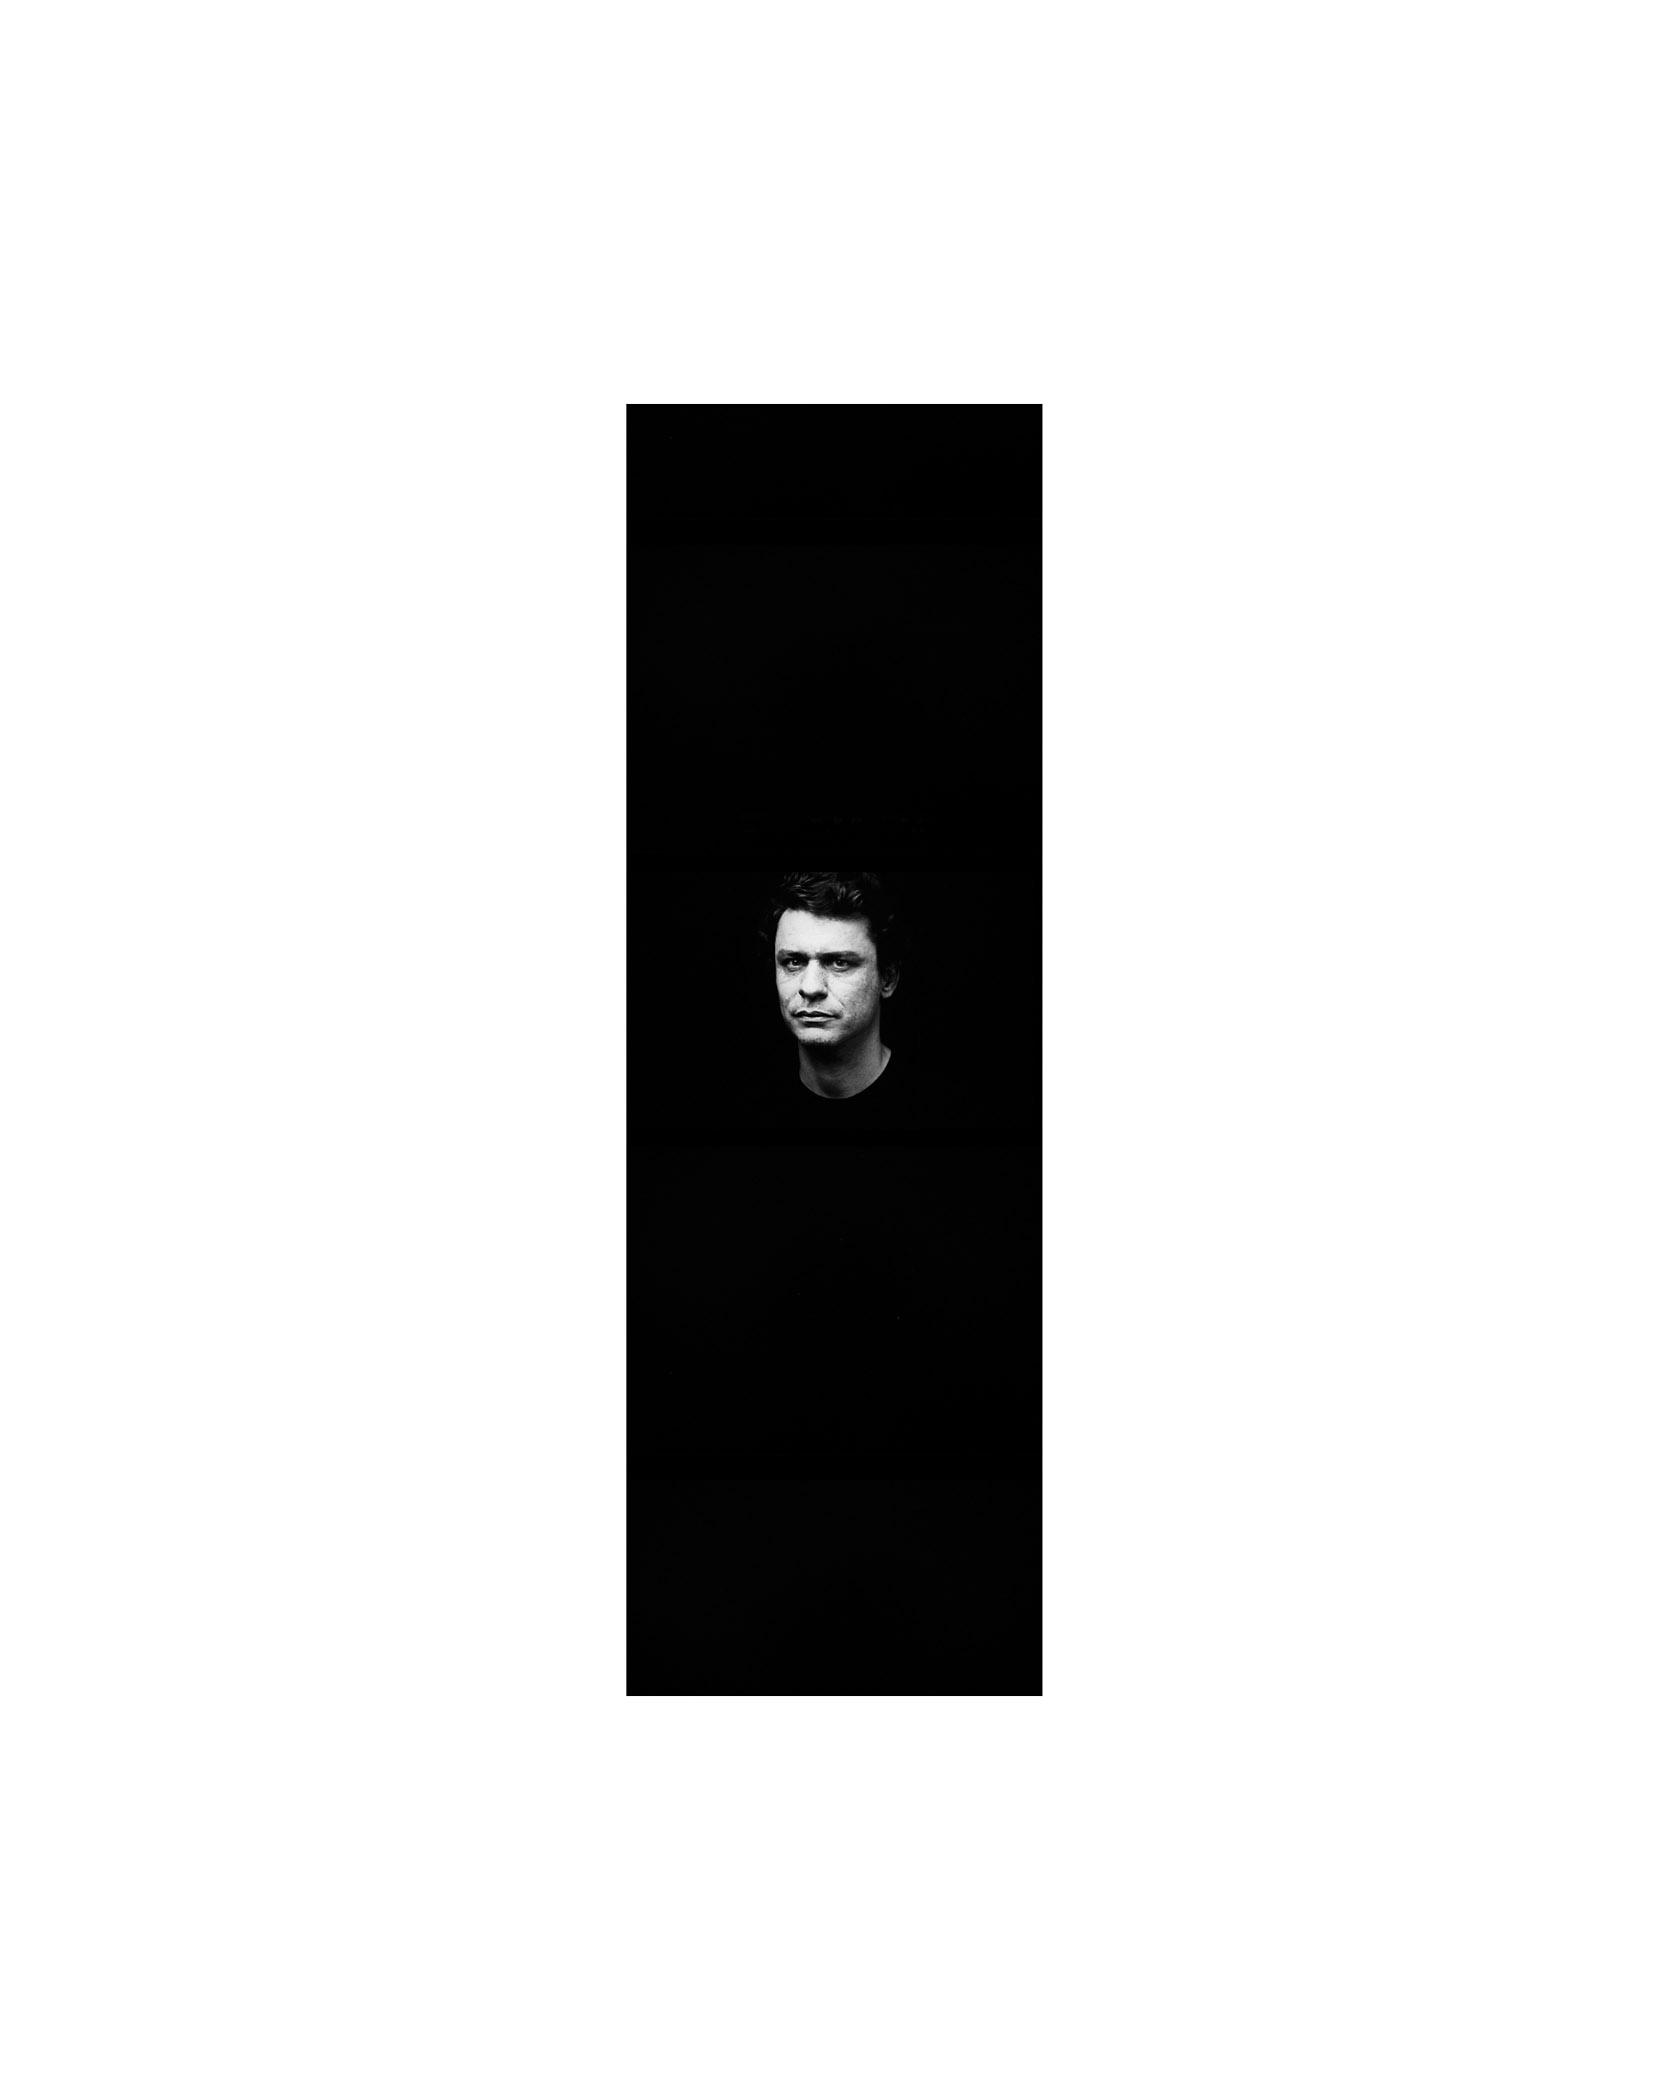 Elisa Julia Gilmour, Death Is Something: Film Stills # 10, 2013